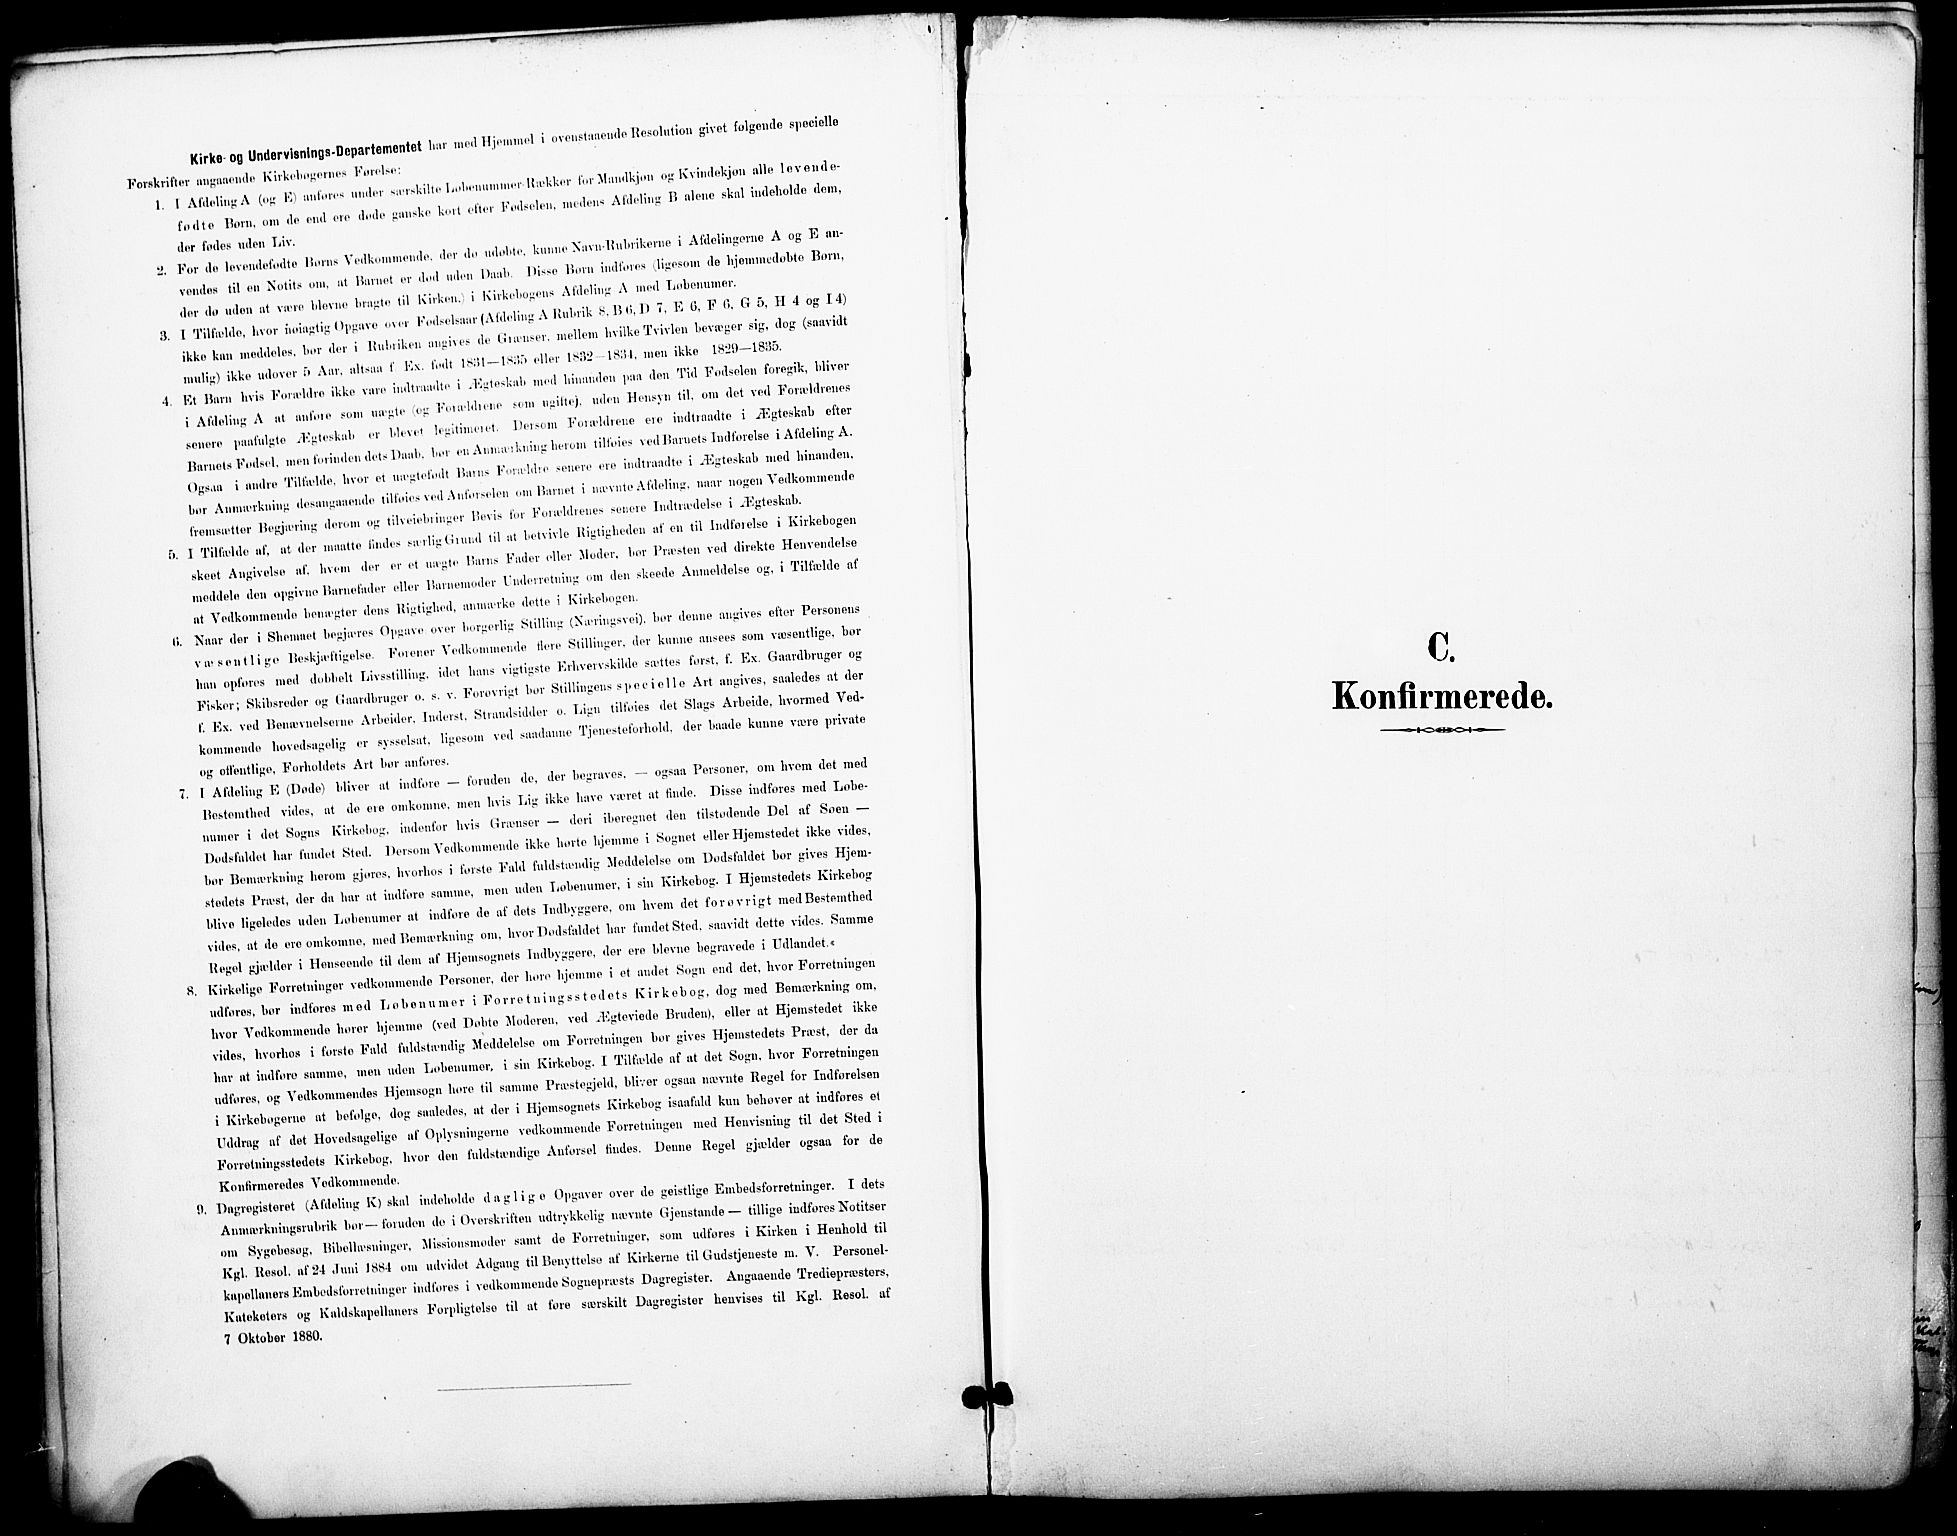 SAO, Petrus prestekontor Kirkebøker, F/Fa/L0006: Ministerialbok nr. 6, 1889-1908